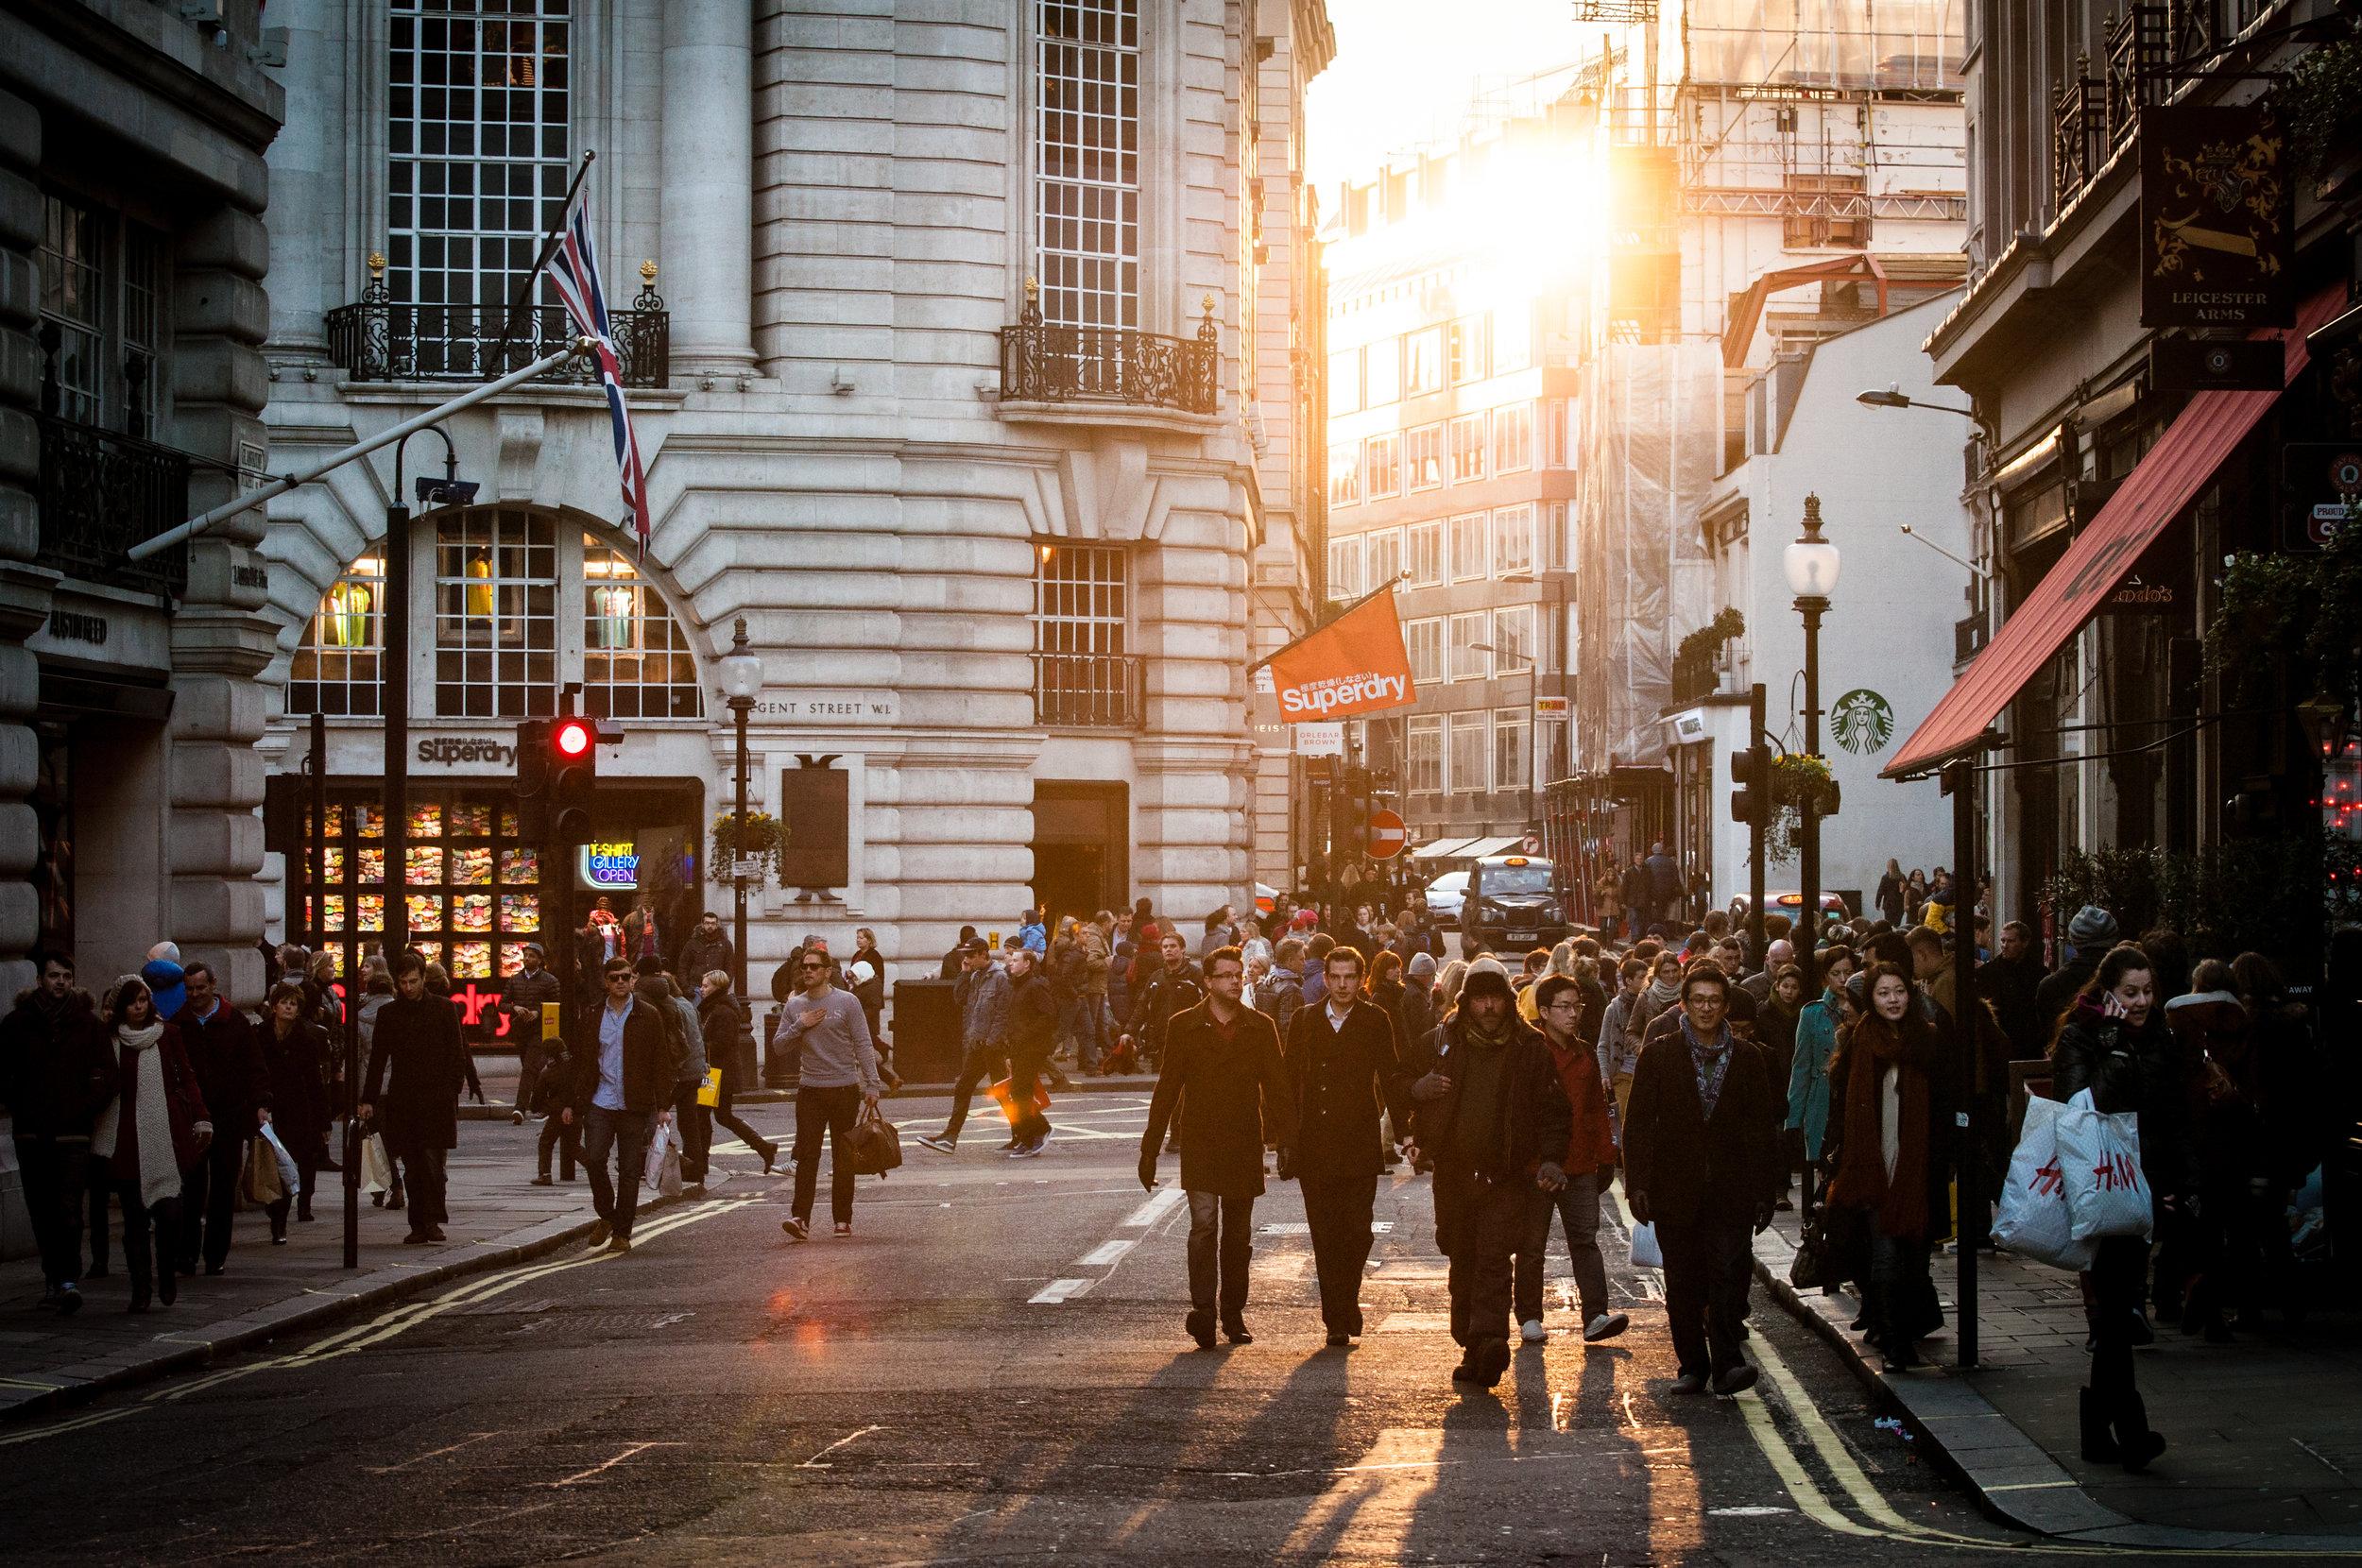 city-sunny-people-street.jpg